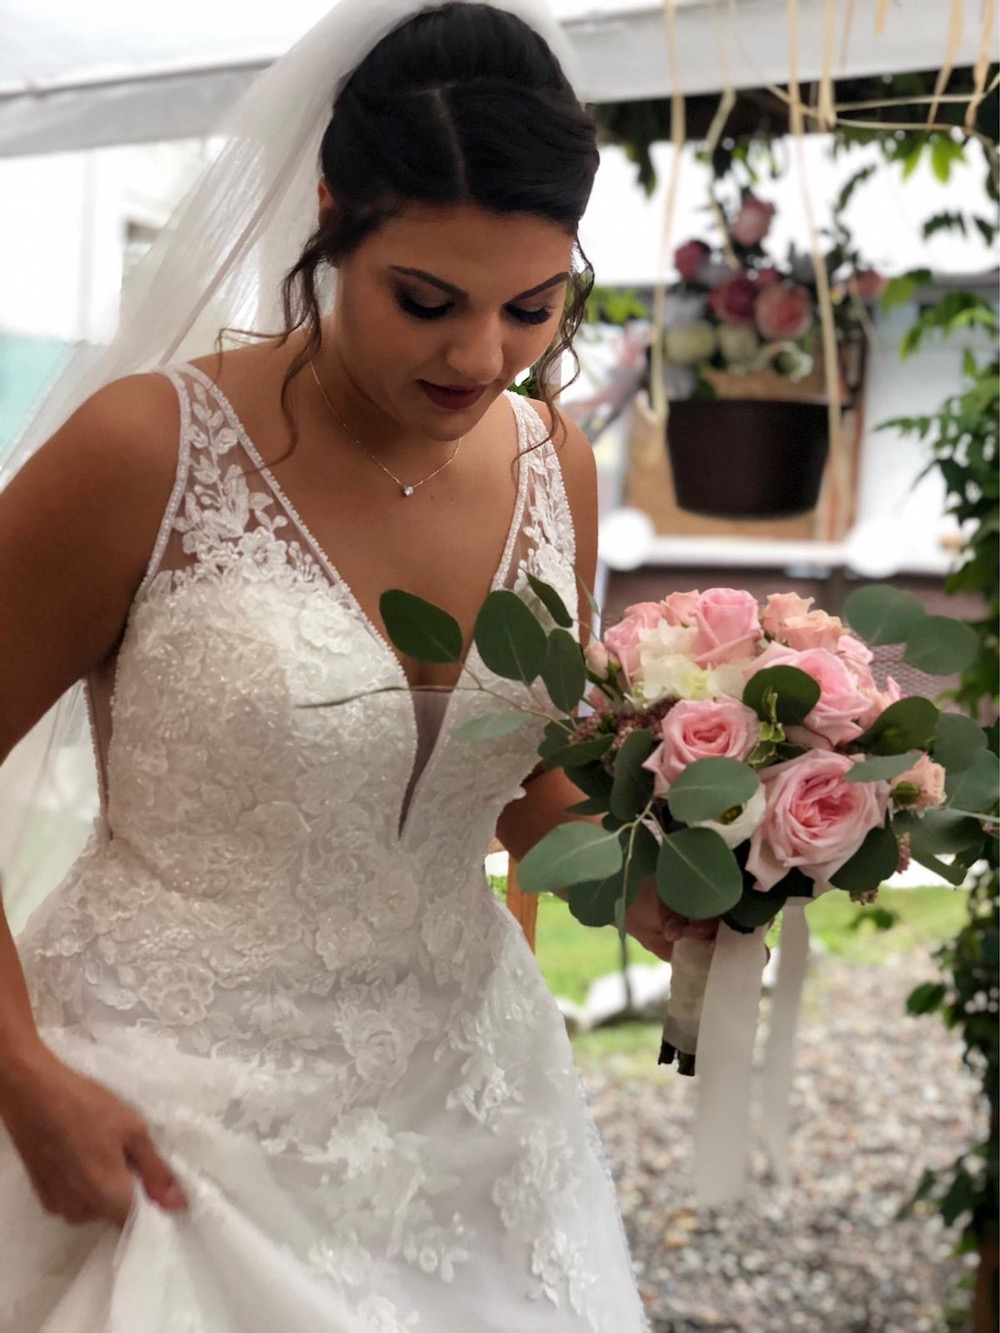 Rosa 6ab24b1e-f067-4837-b78a-33d4da6efc9eWedding allestimento floreale rossana flower store novellino